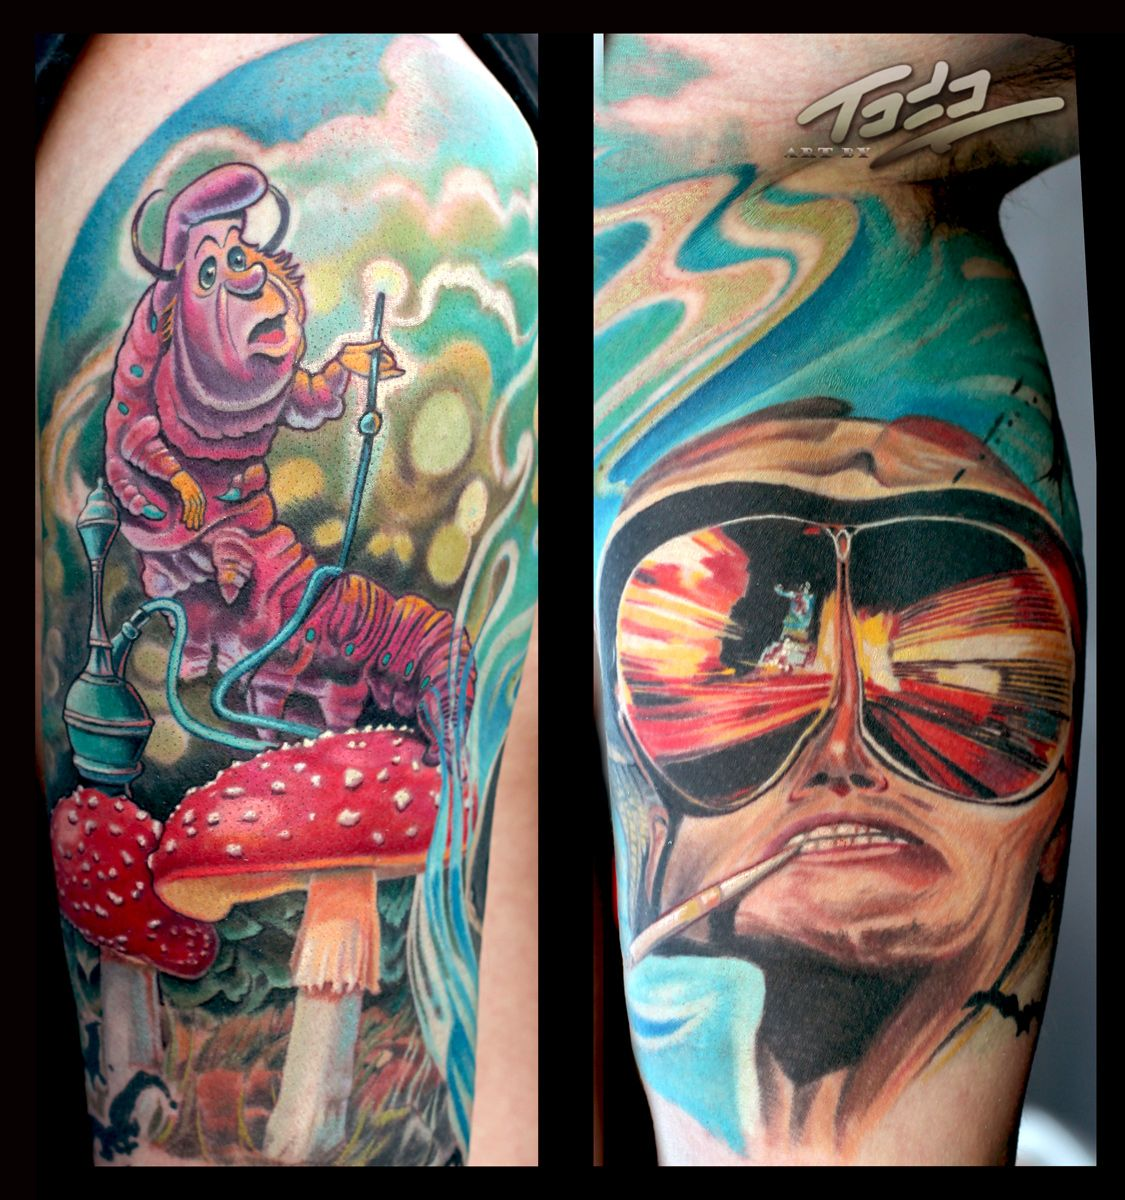 caterpillar tattoo - Google Search | Tattoo ideas | Pinterest ... - Tattoo Alice Im Wunderland